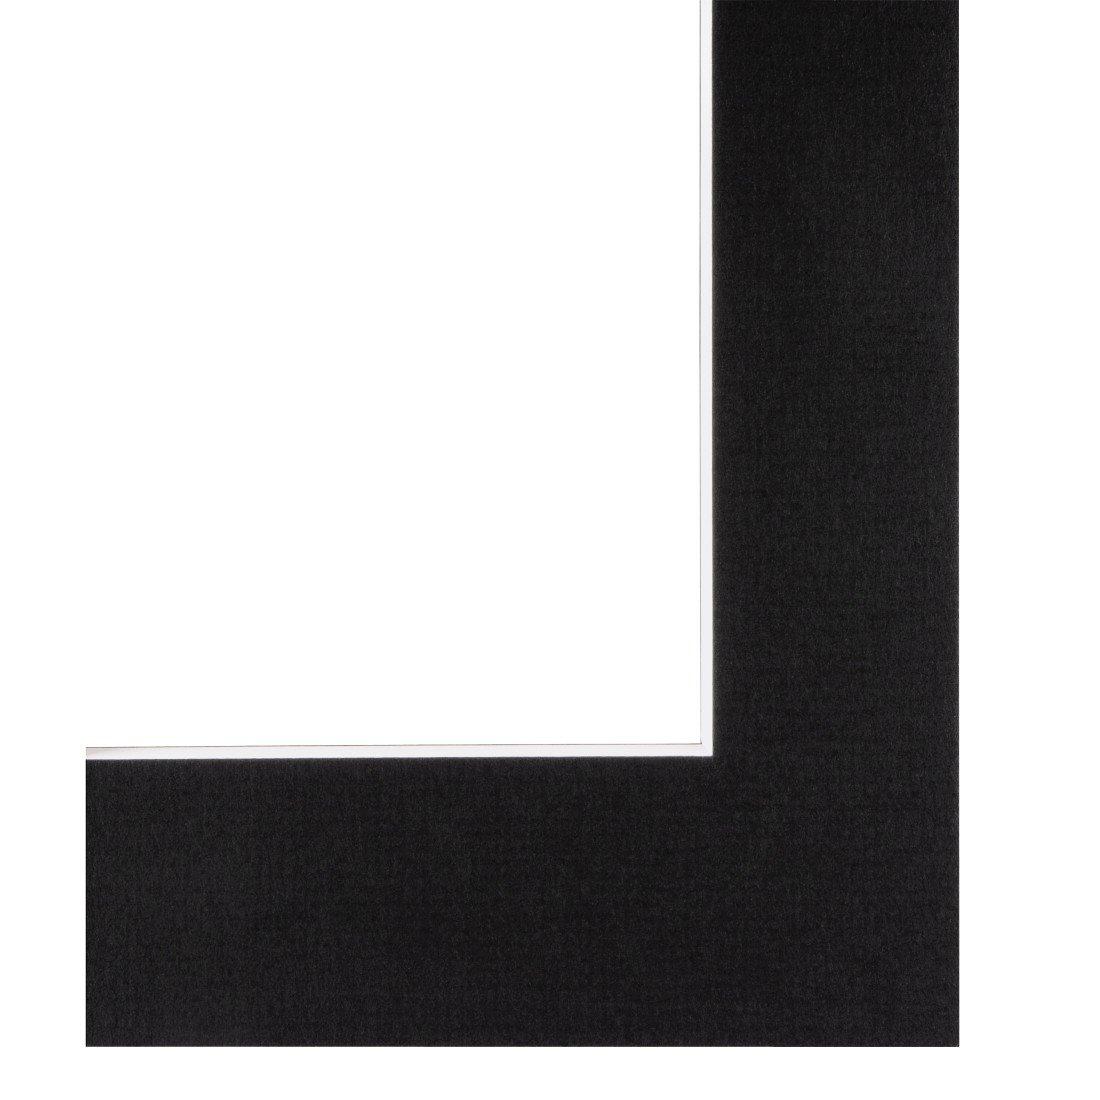 Hama 00063247 Passe-partout , 40 x 50 cm per foto 30 x 40 cm, colore: Nero